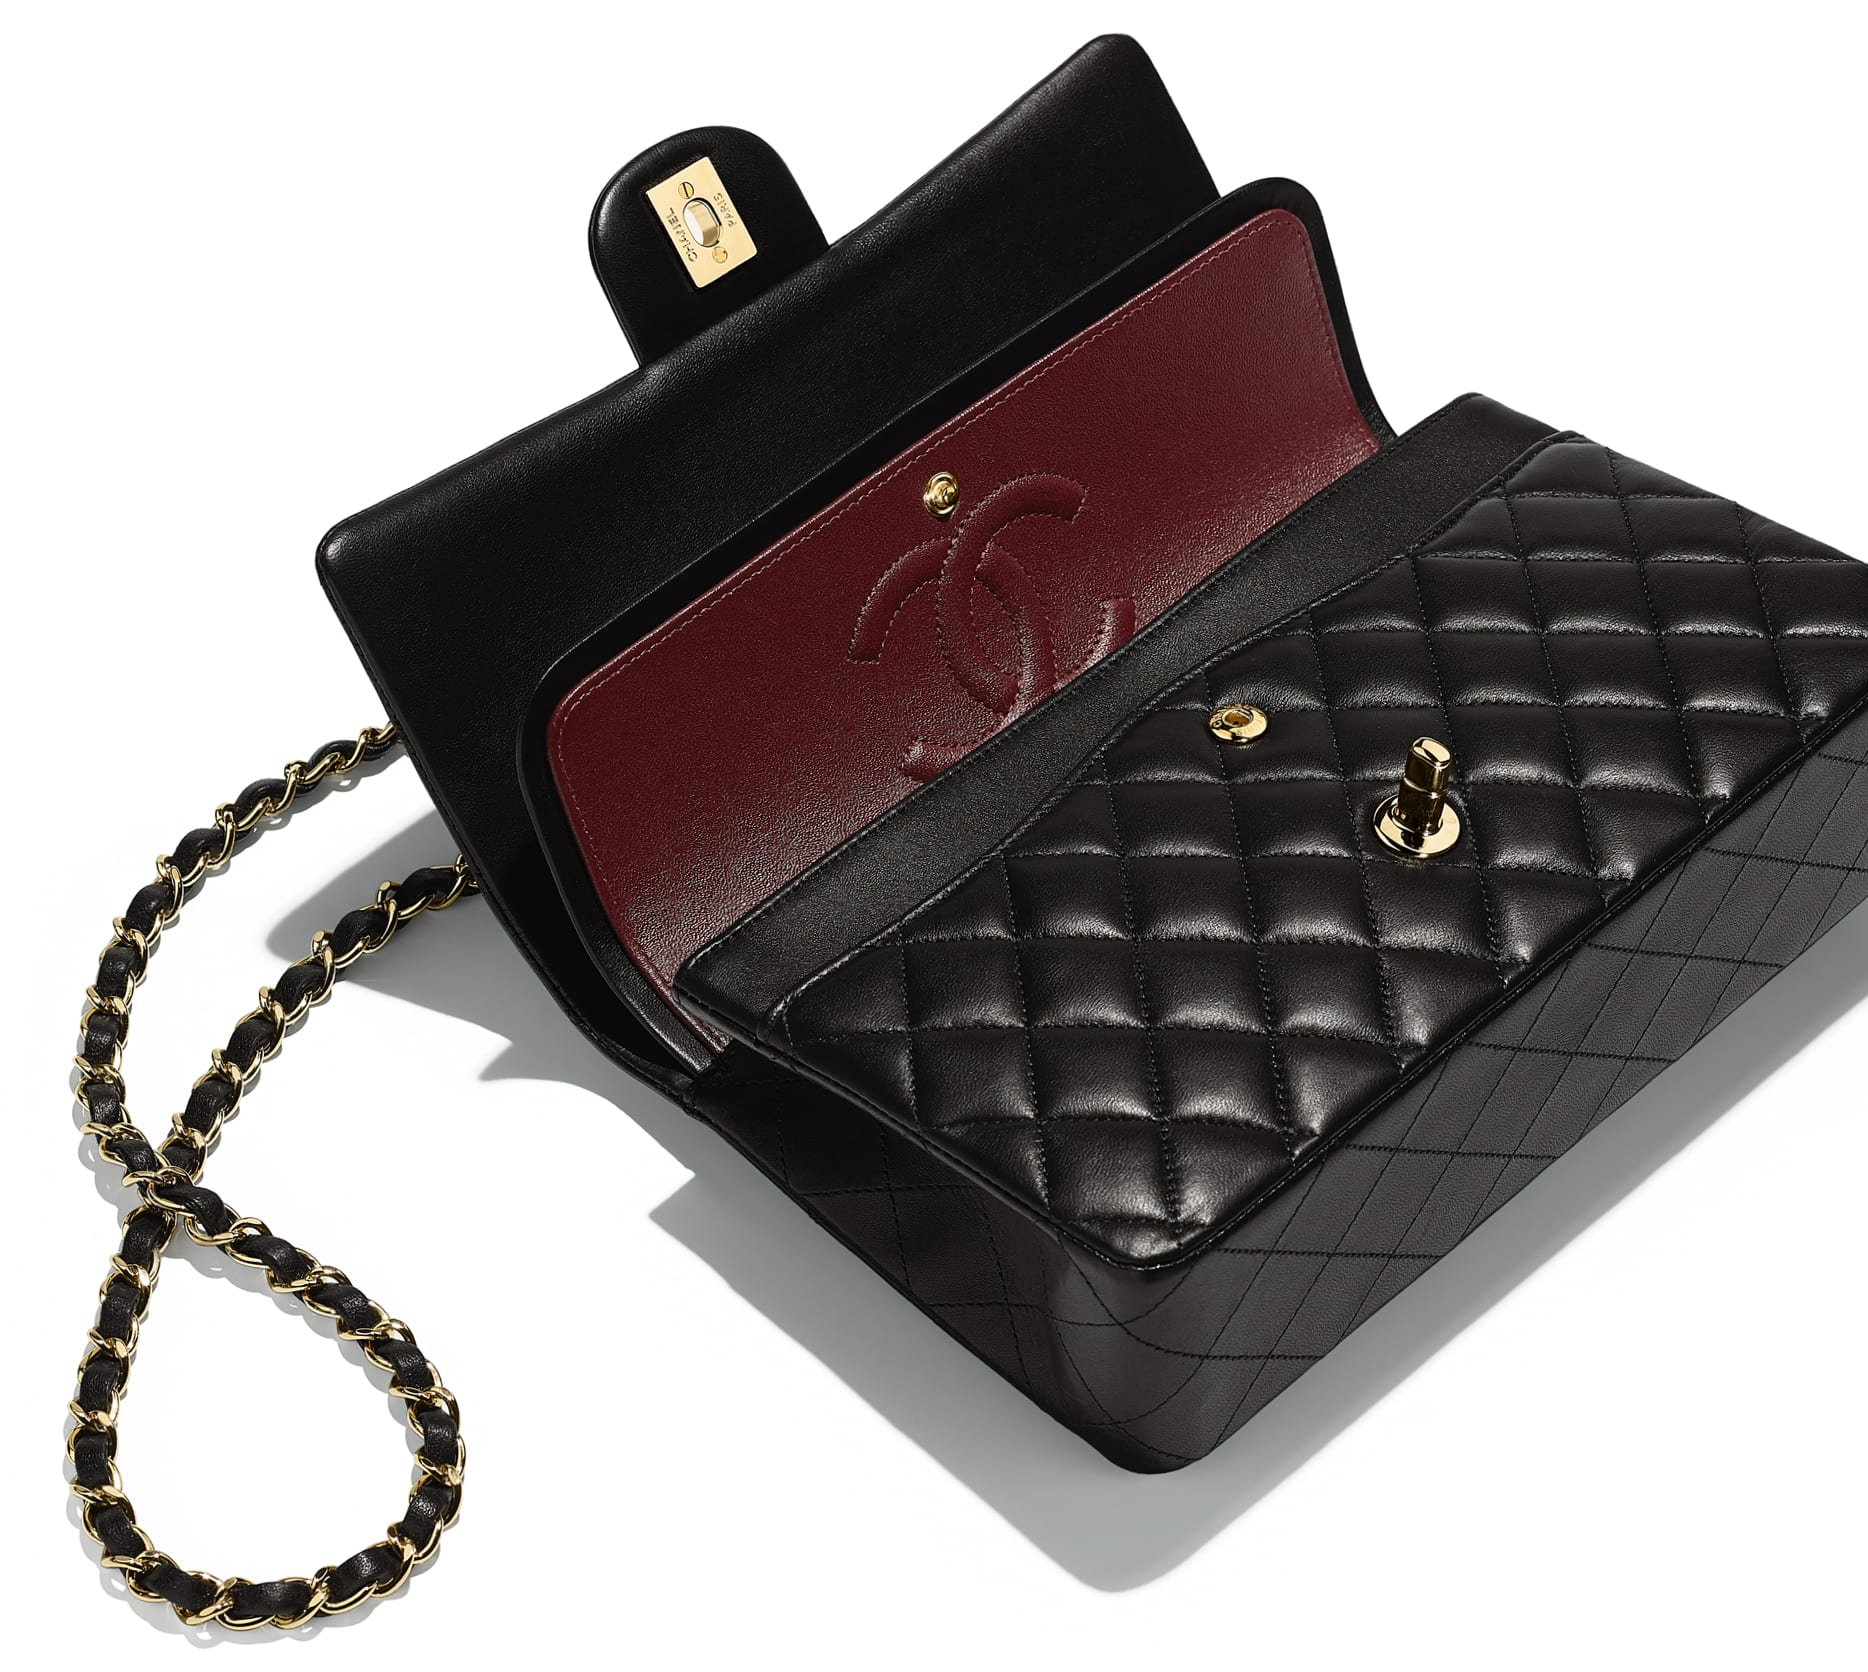 b7e82845cb09da Classic Handbags - Handbags - CHANEL